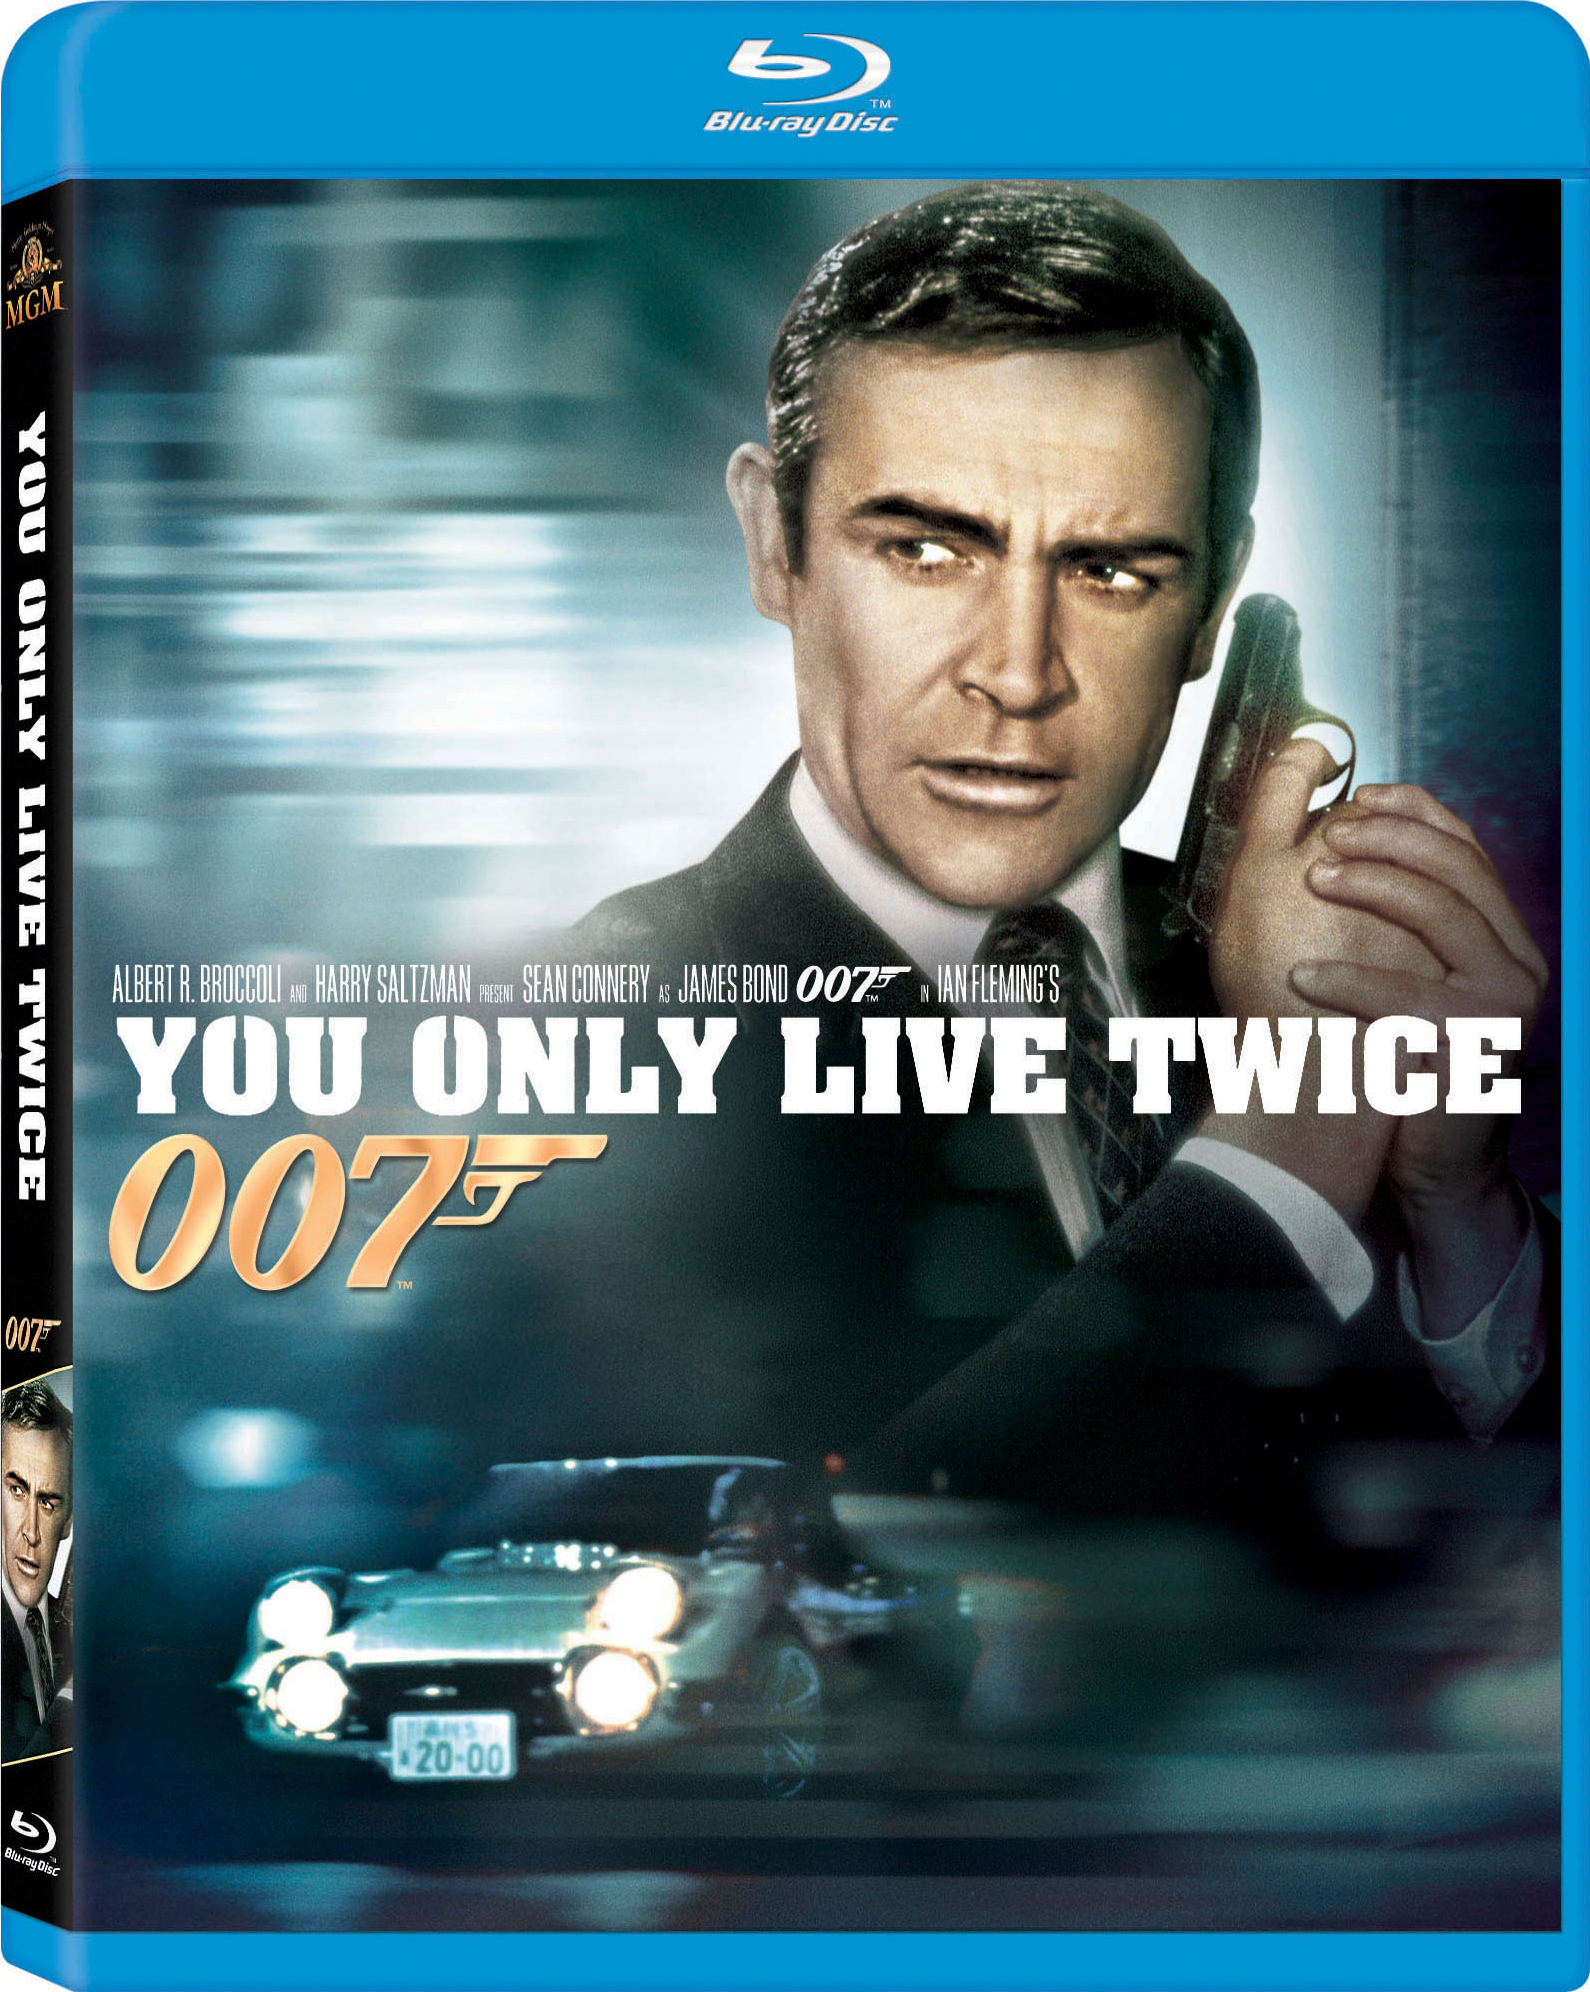 Casino royale 007 full movie free download mp4 gambling sites ireland